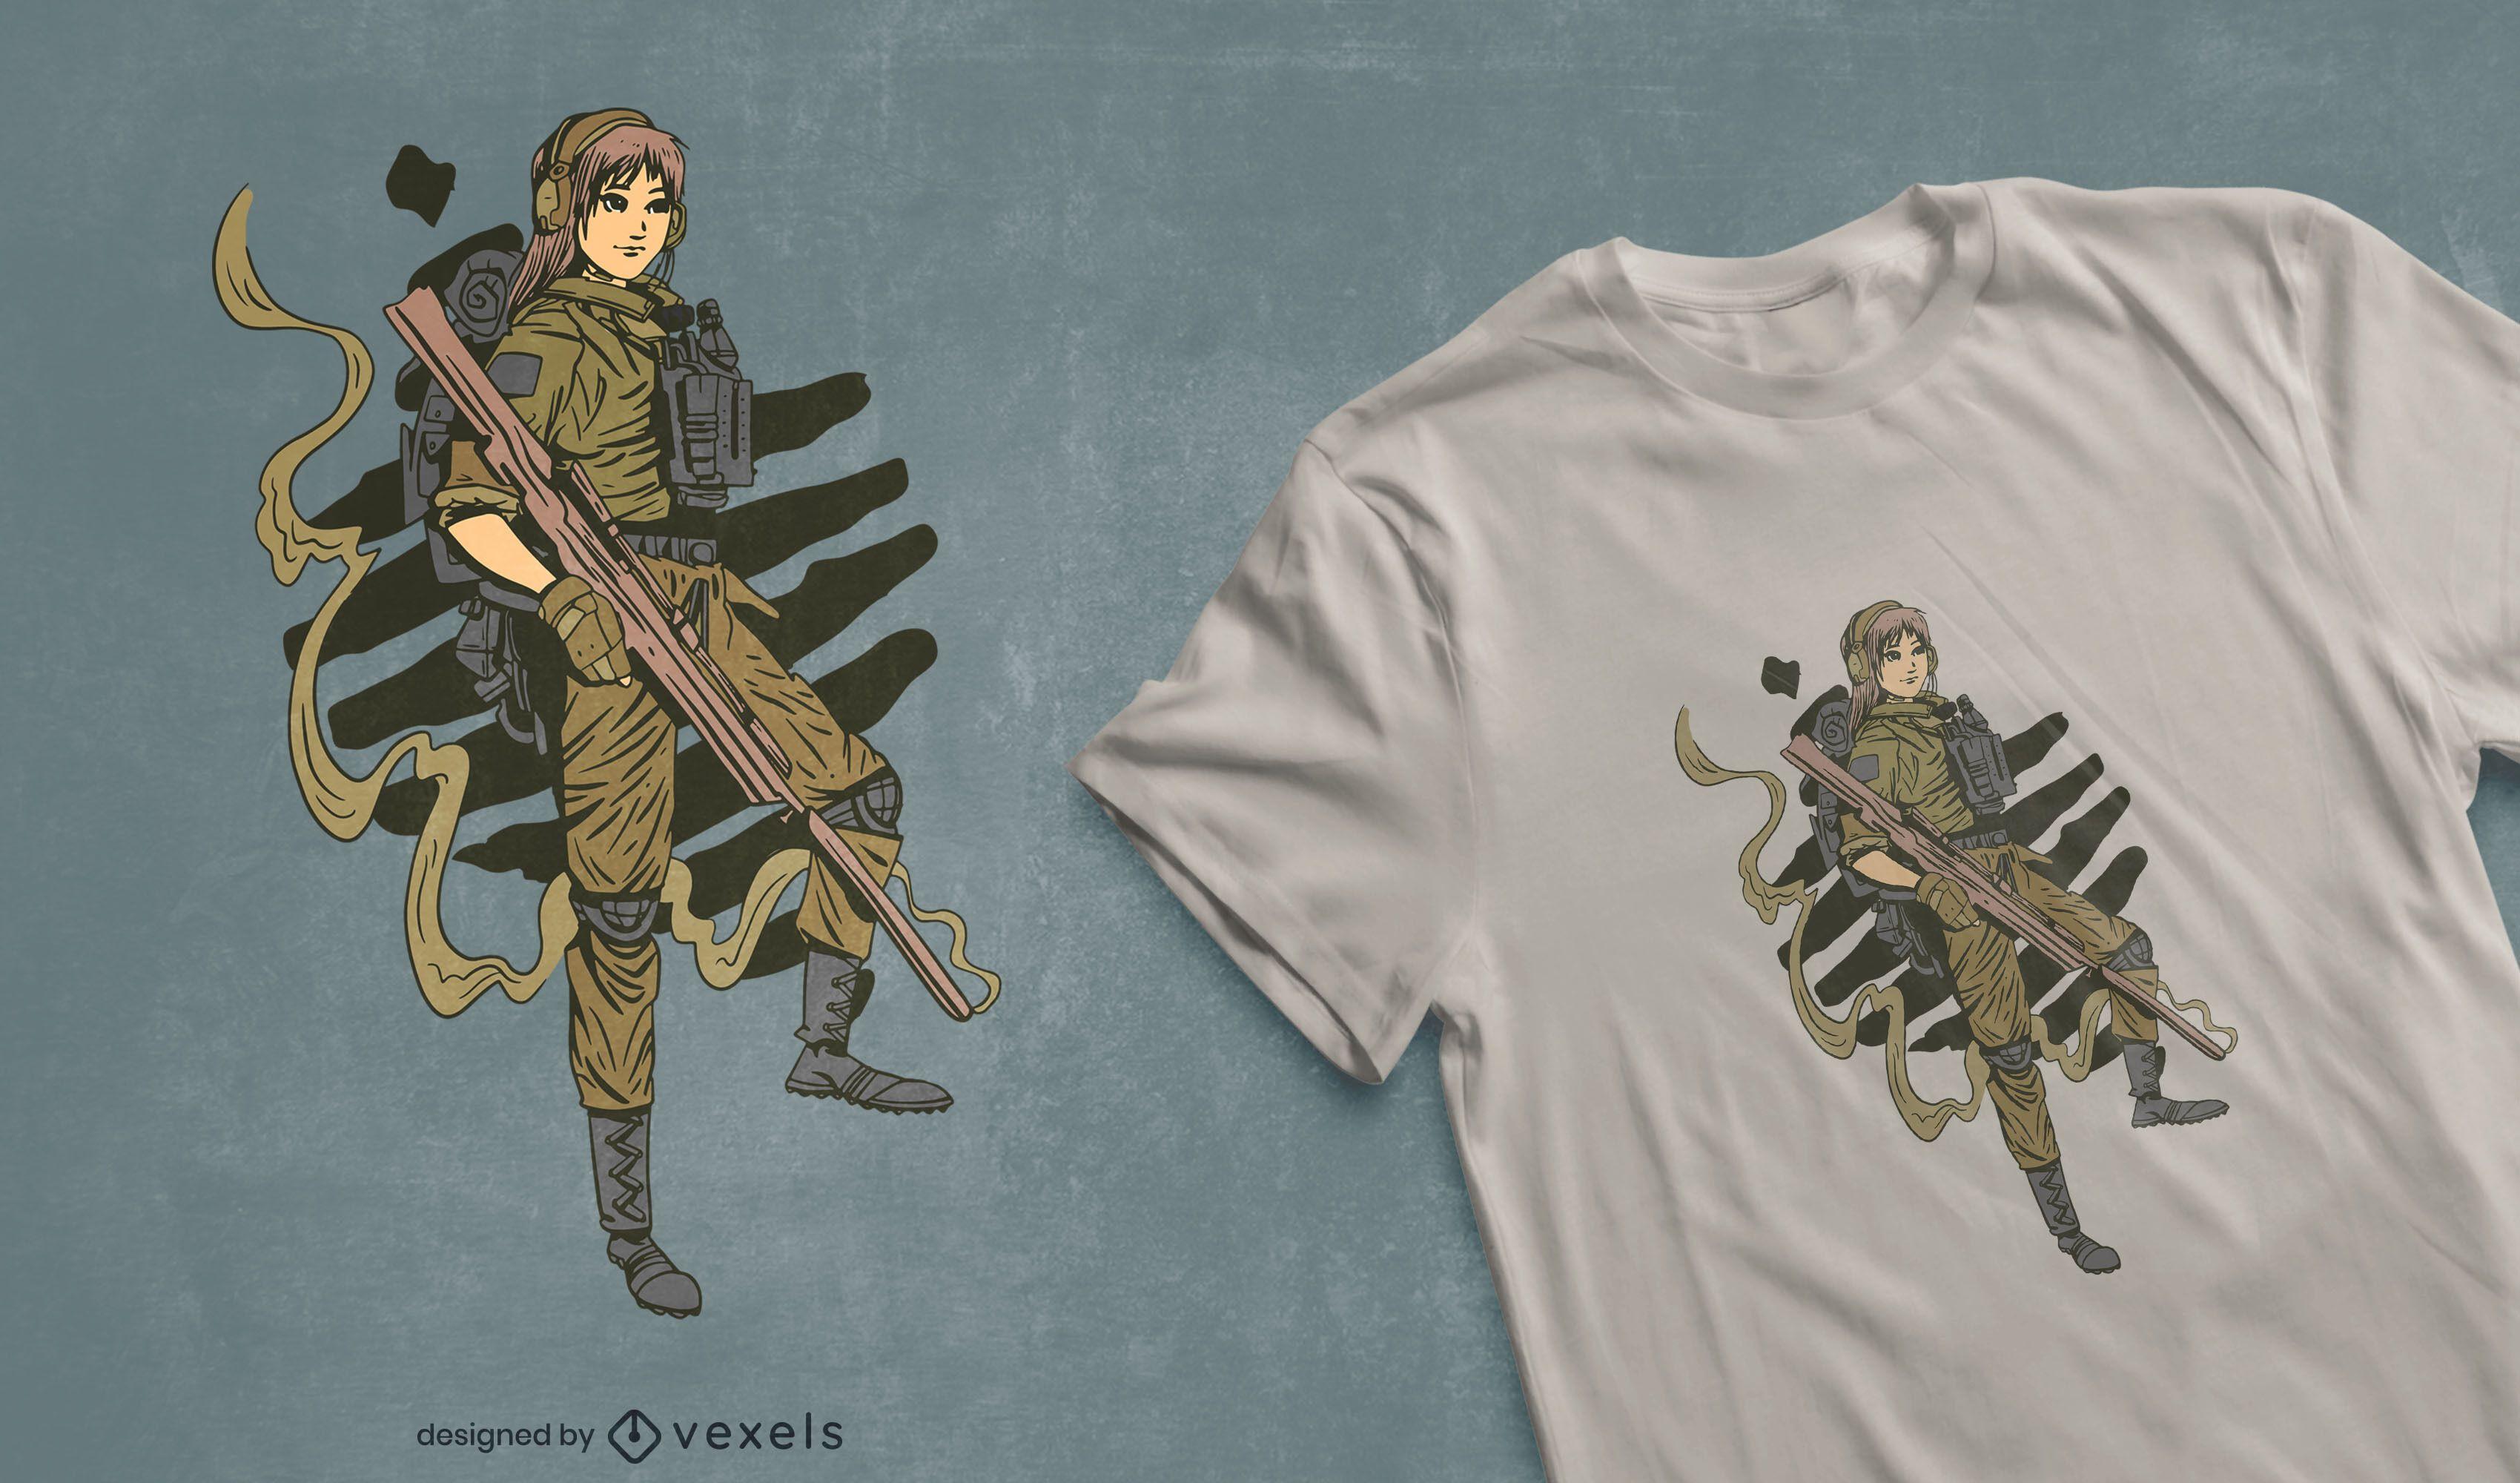 Female soldier t-shirt design